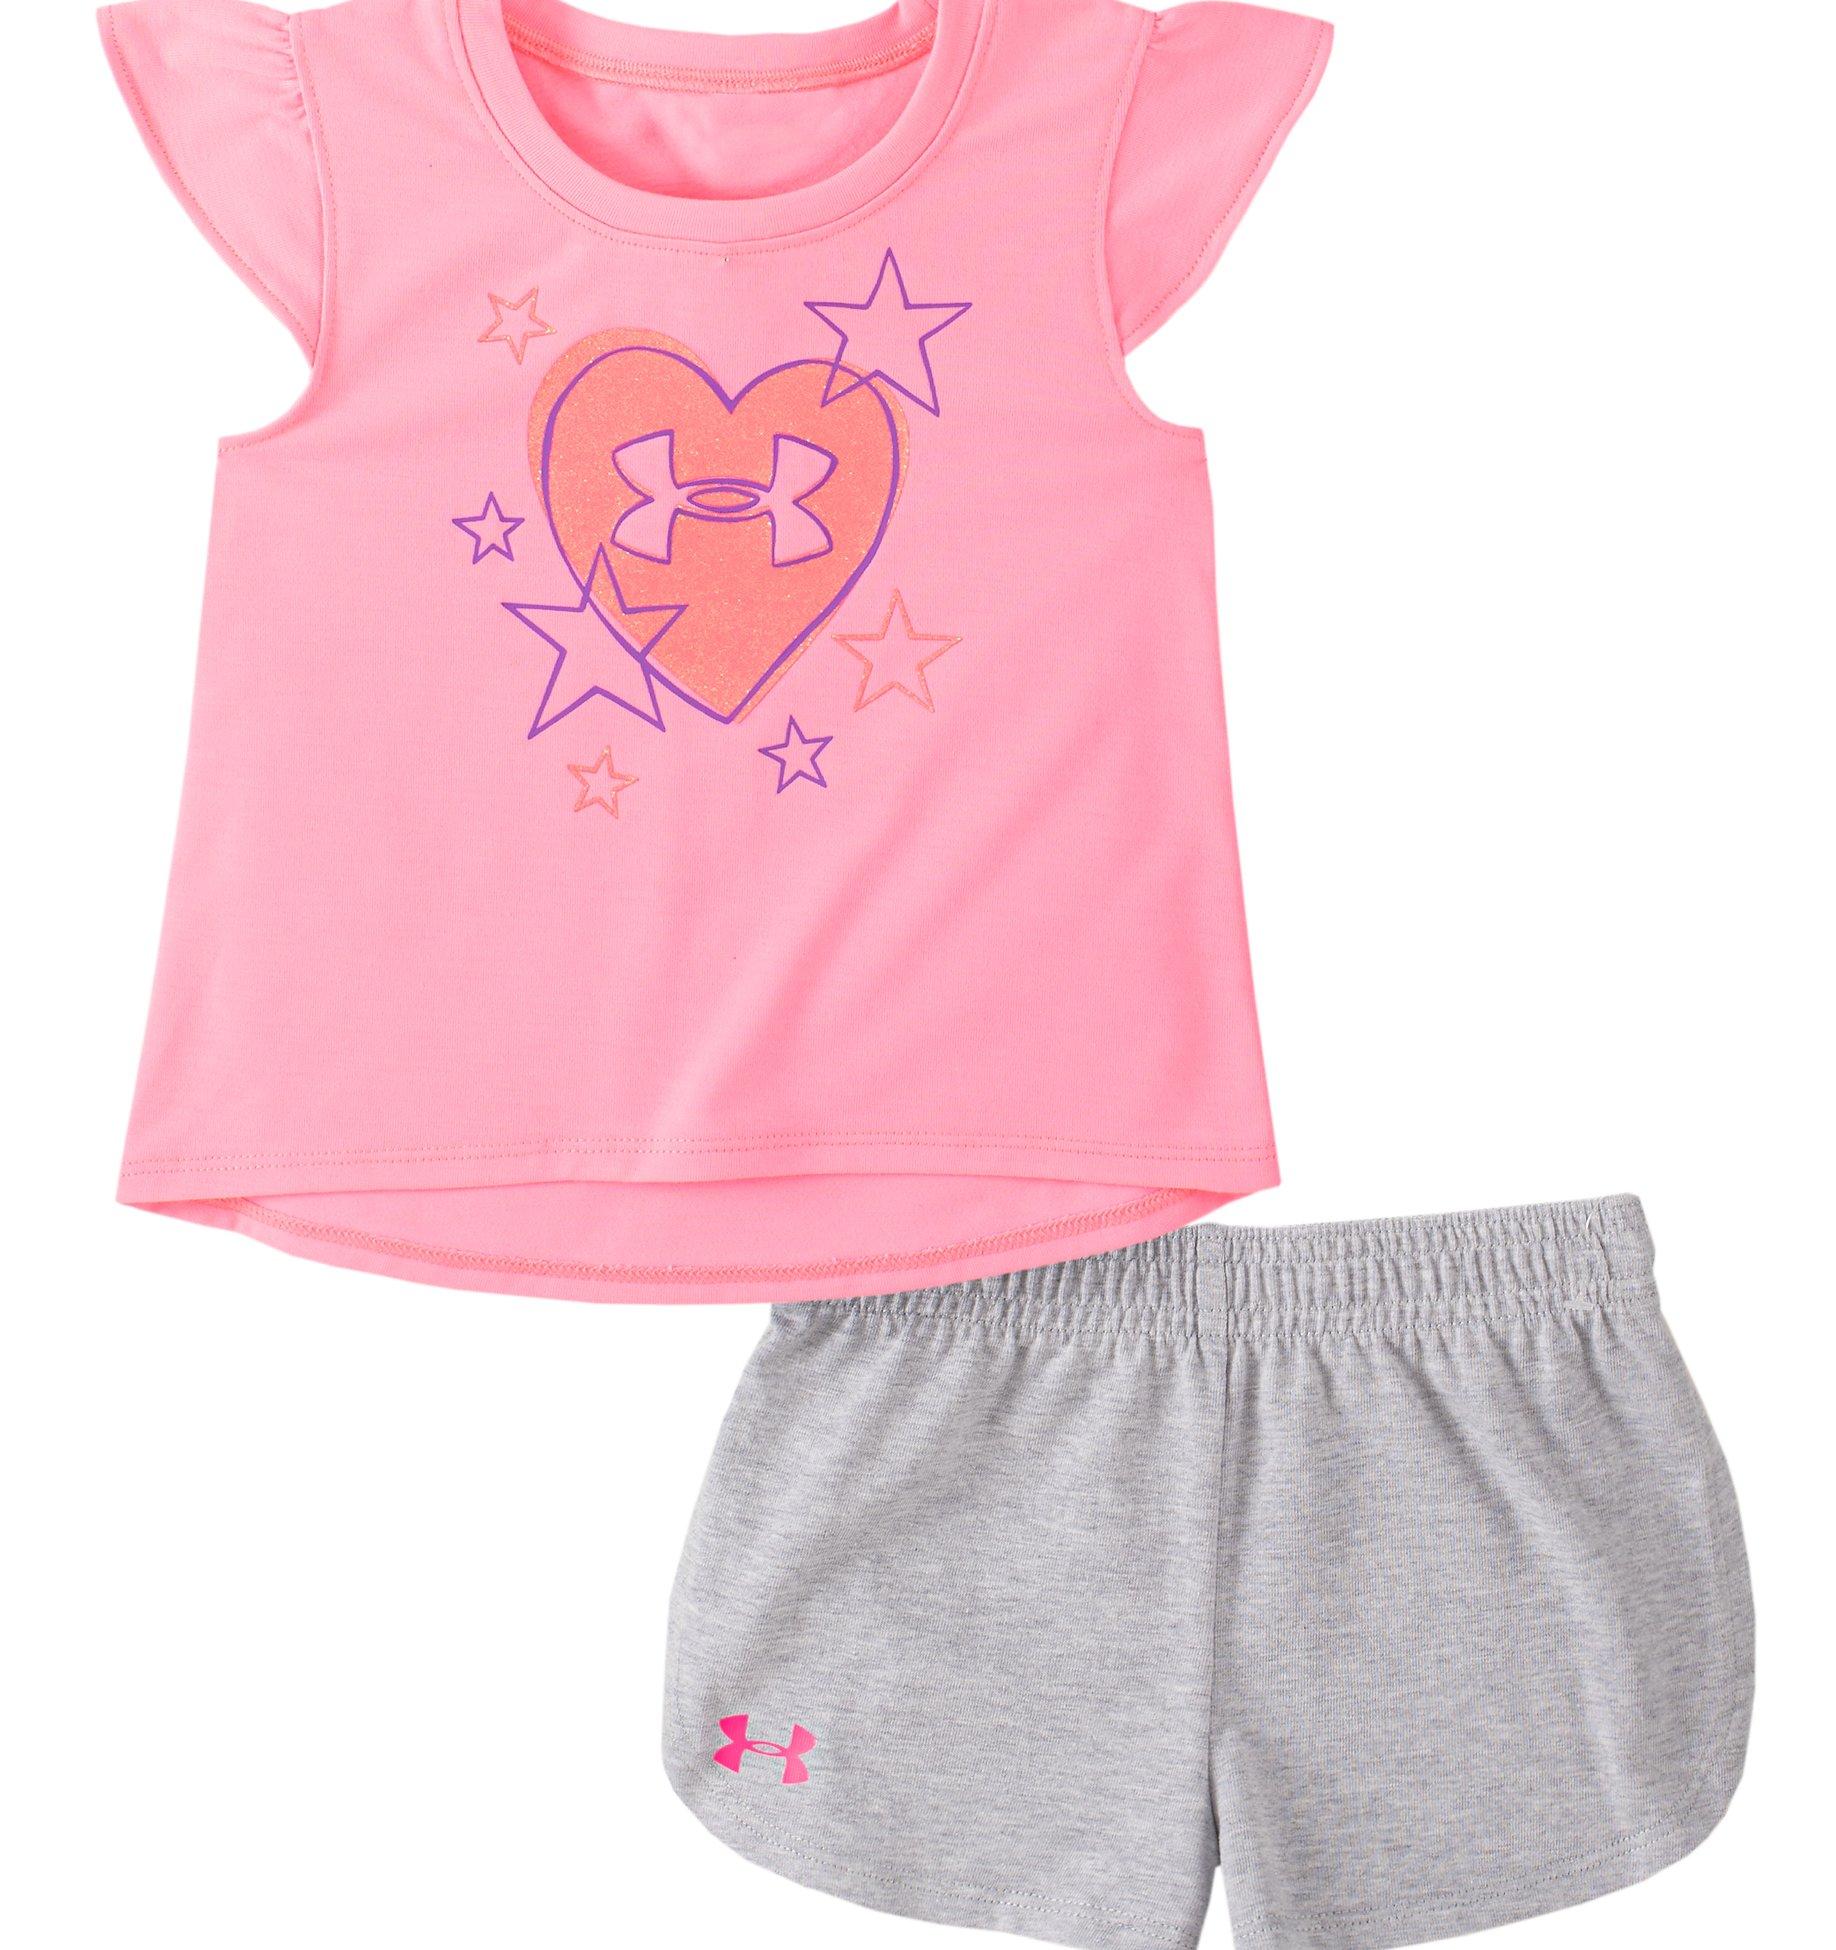 Underarmour Girls Infant UA Star Crossed Set